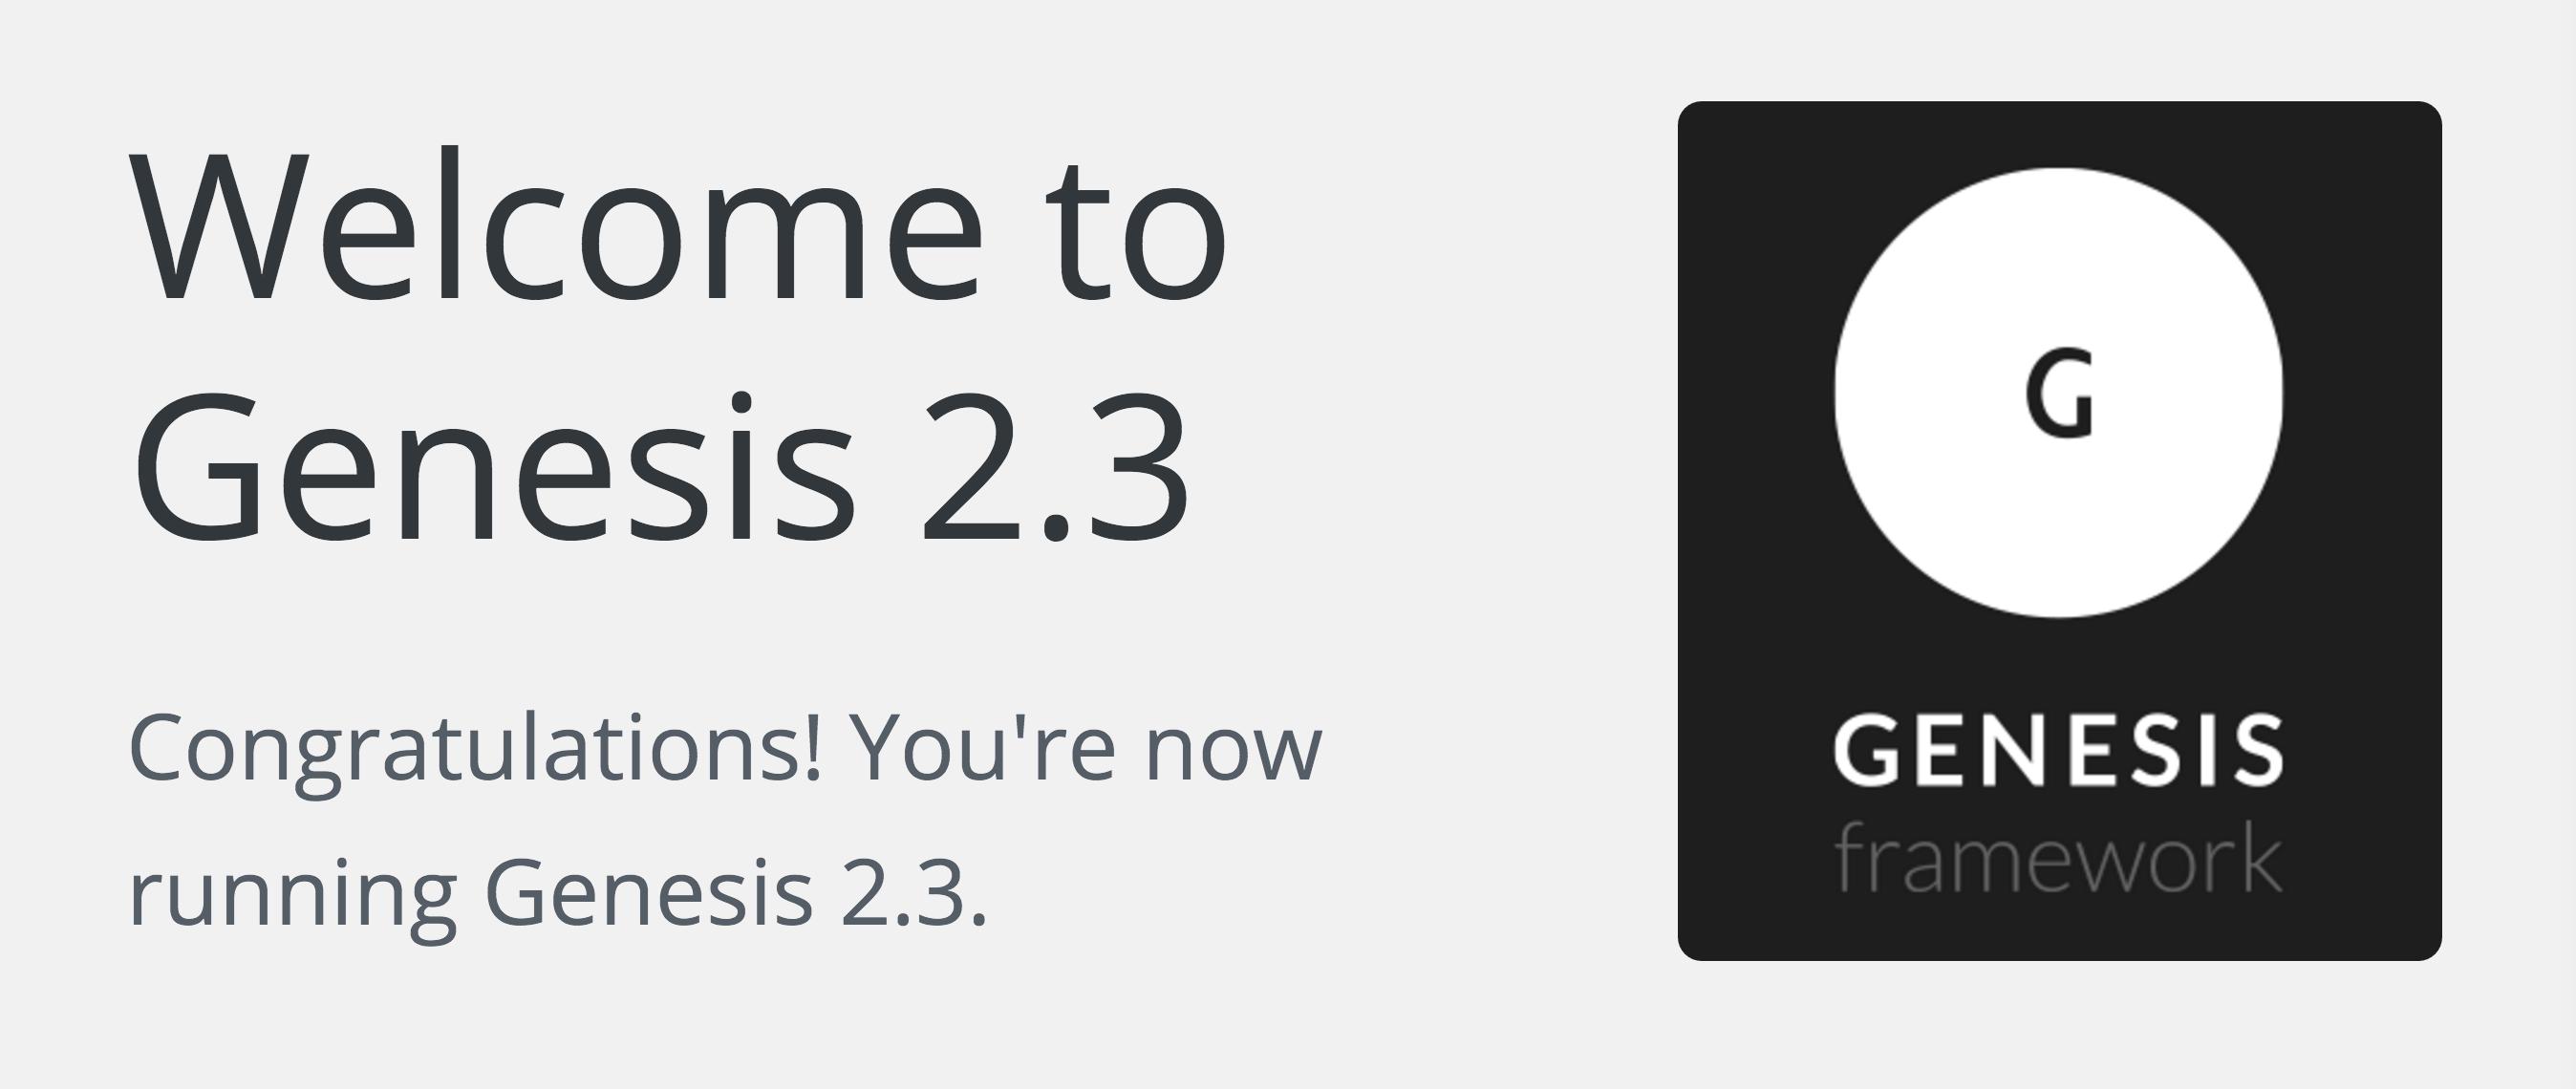 Genesis Framework 2.3 Update WordPress